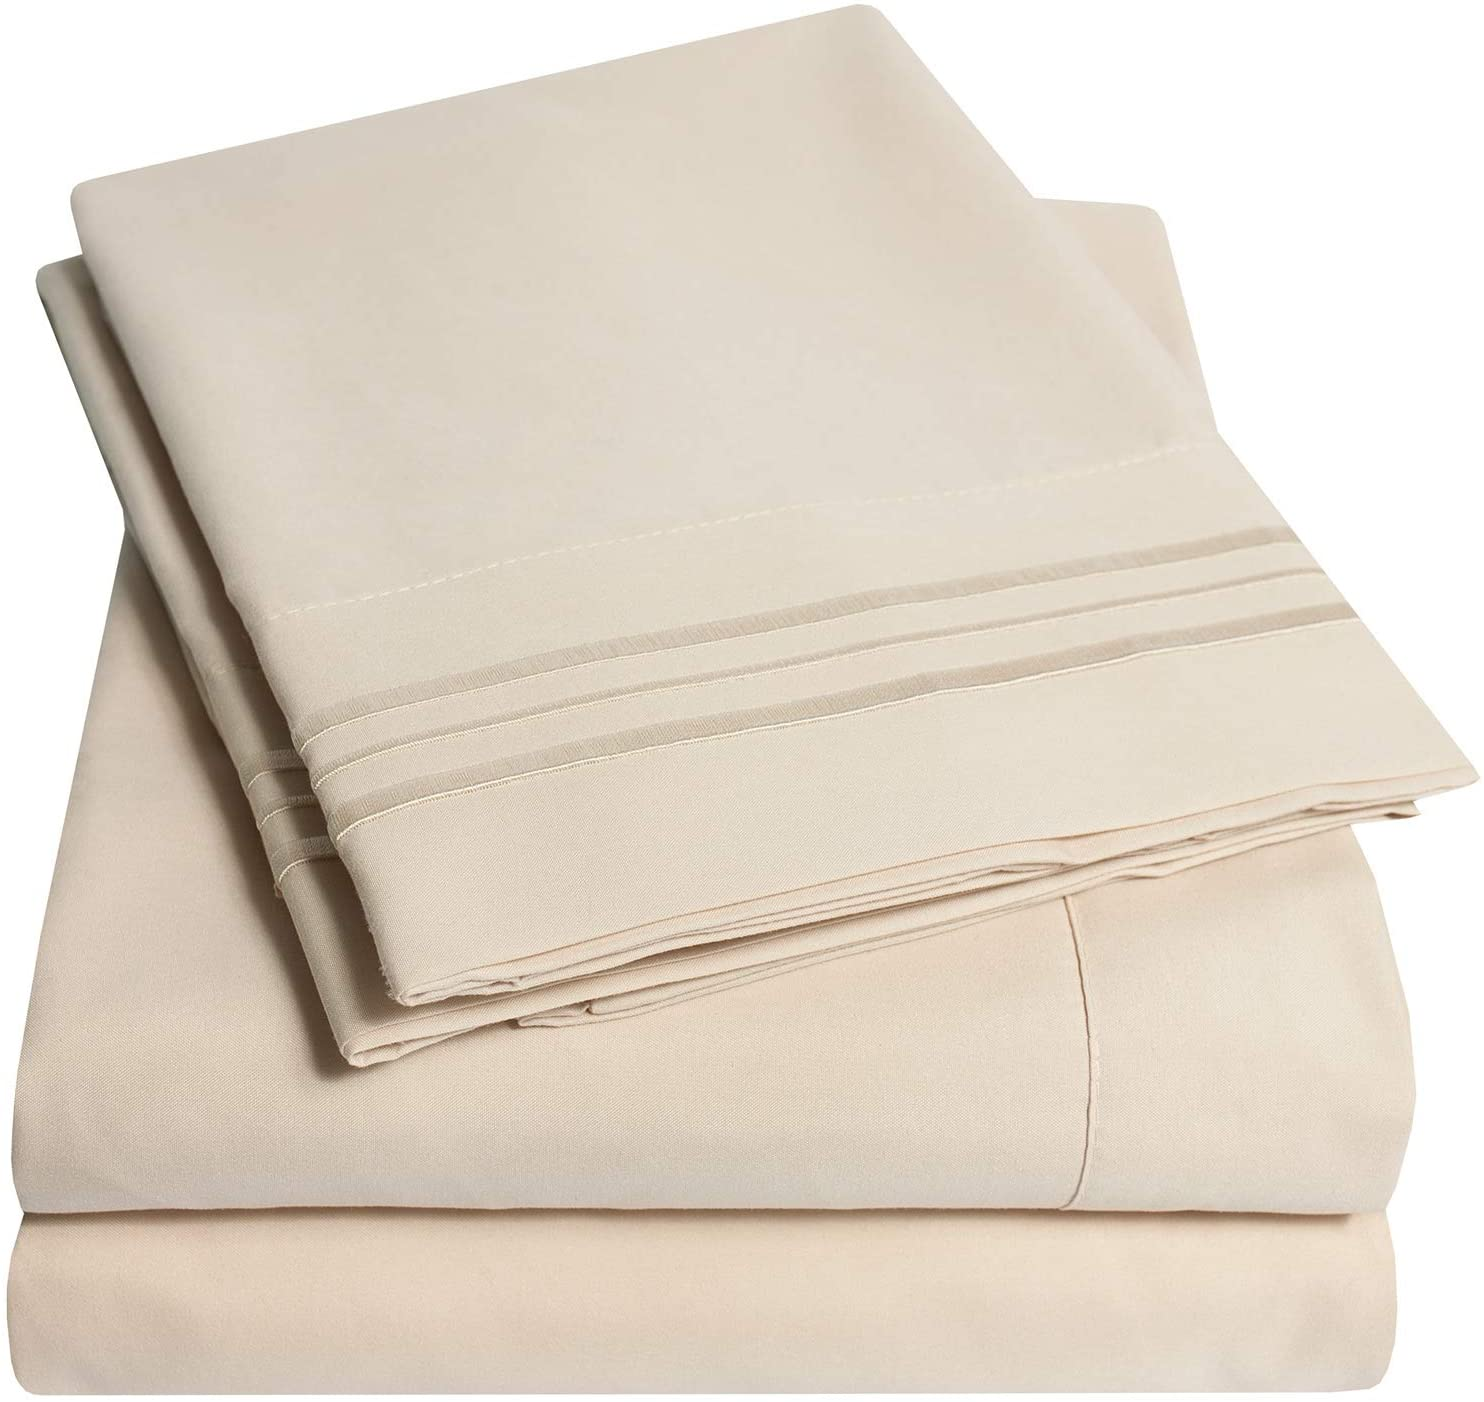 1500 Supreme Collection Bed Sheet Set - Extra Soft, Elastic Corner Straps, Deep Pockets, Wrinkle & Fade Resistant Hypoallergenic Sheets Set, Luxury Hotel Bedding, King, Beige